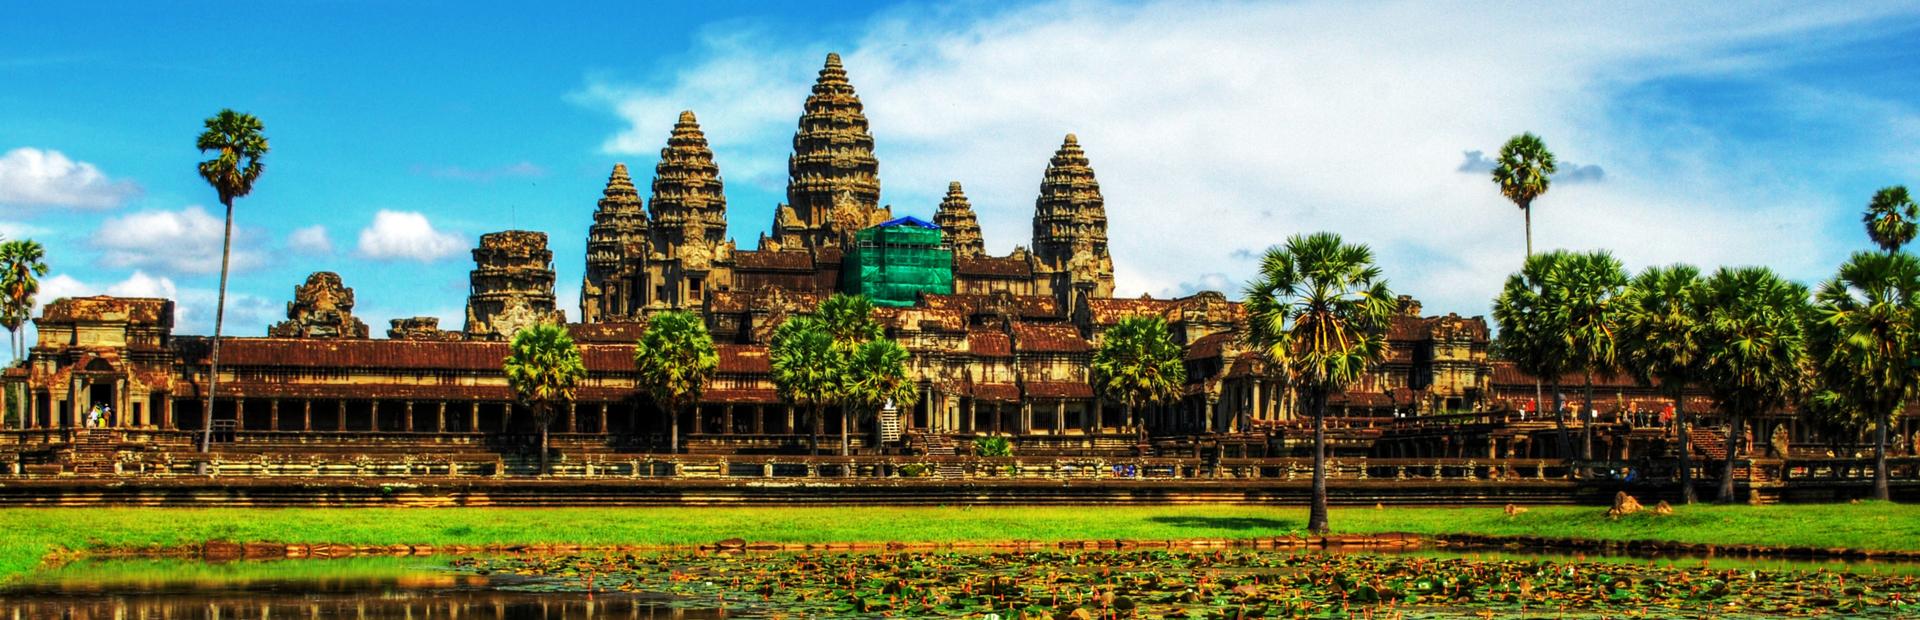 Cambodia_Tour_1920x620